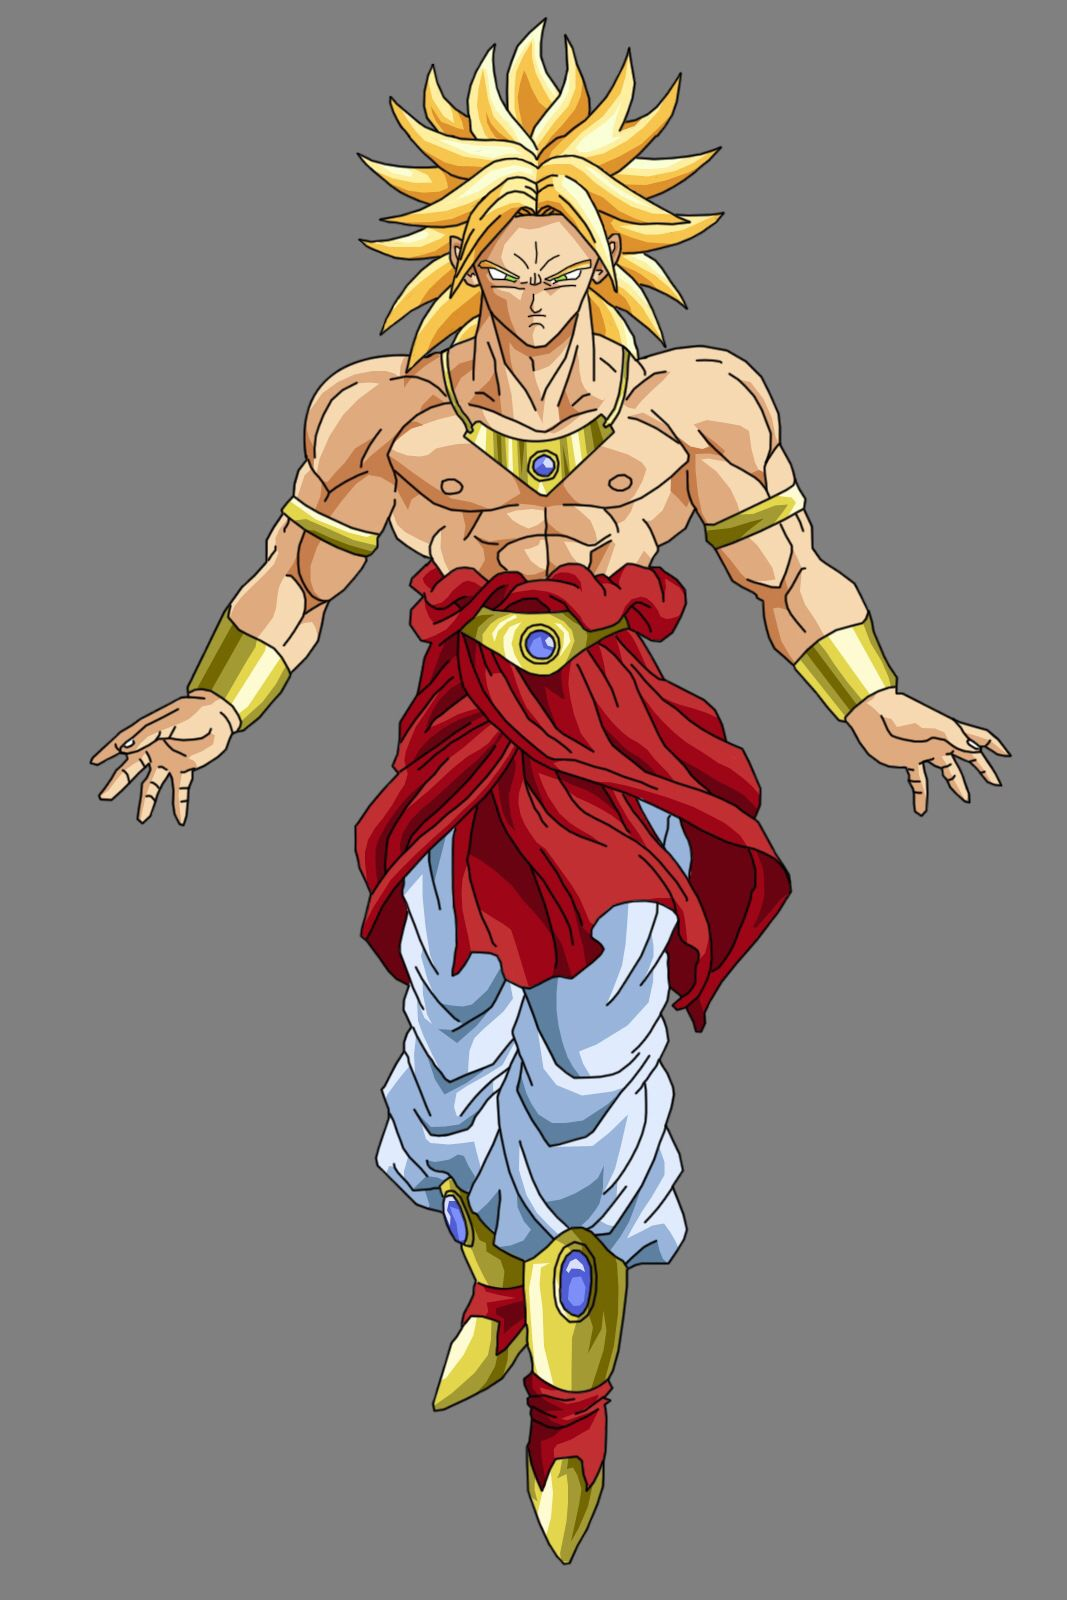 Broly L Dragonball Z Personajes De Dragon Ball Personajes De Goku Personajes De Mortal Kombat